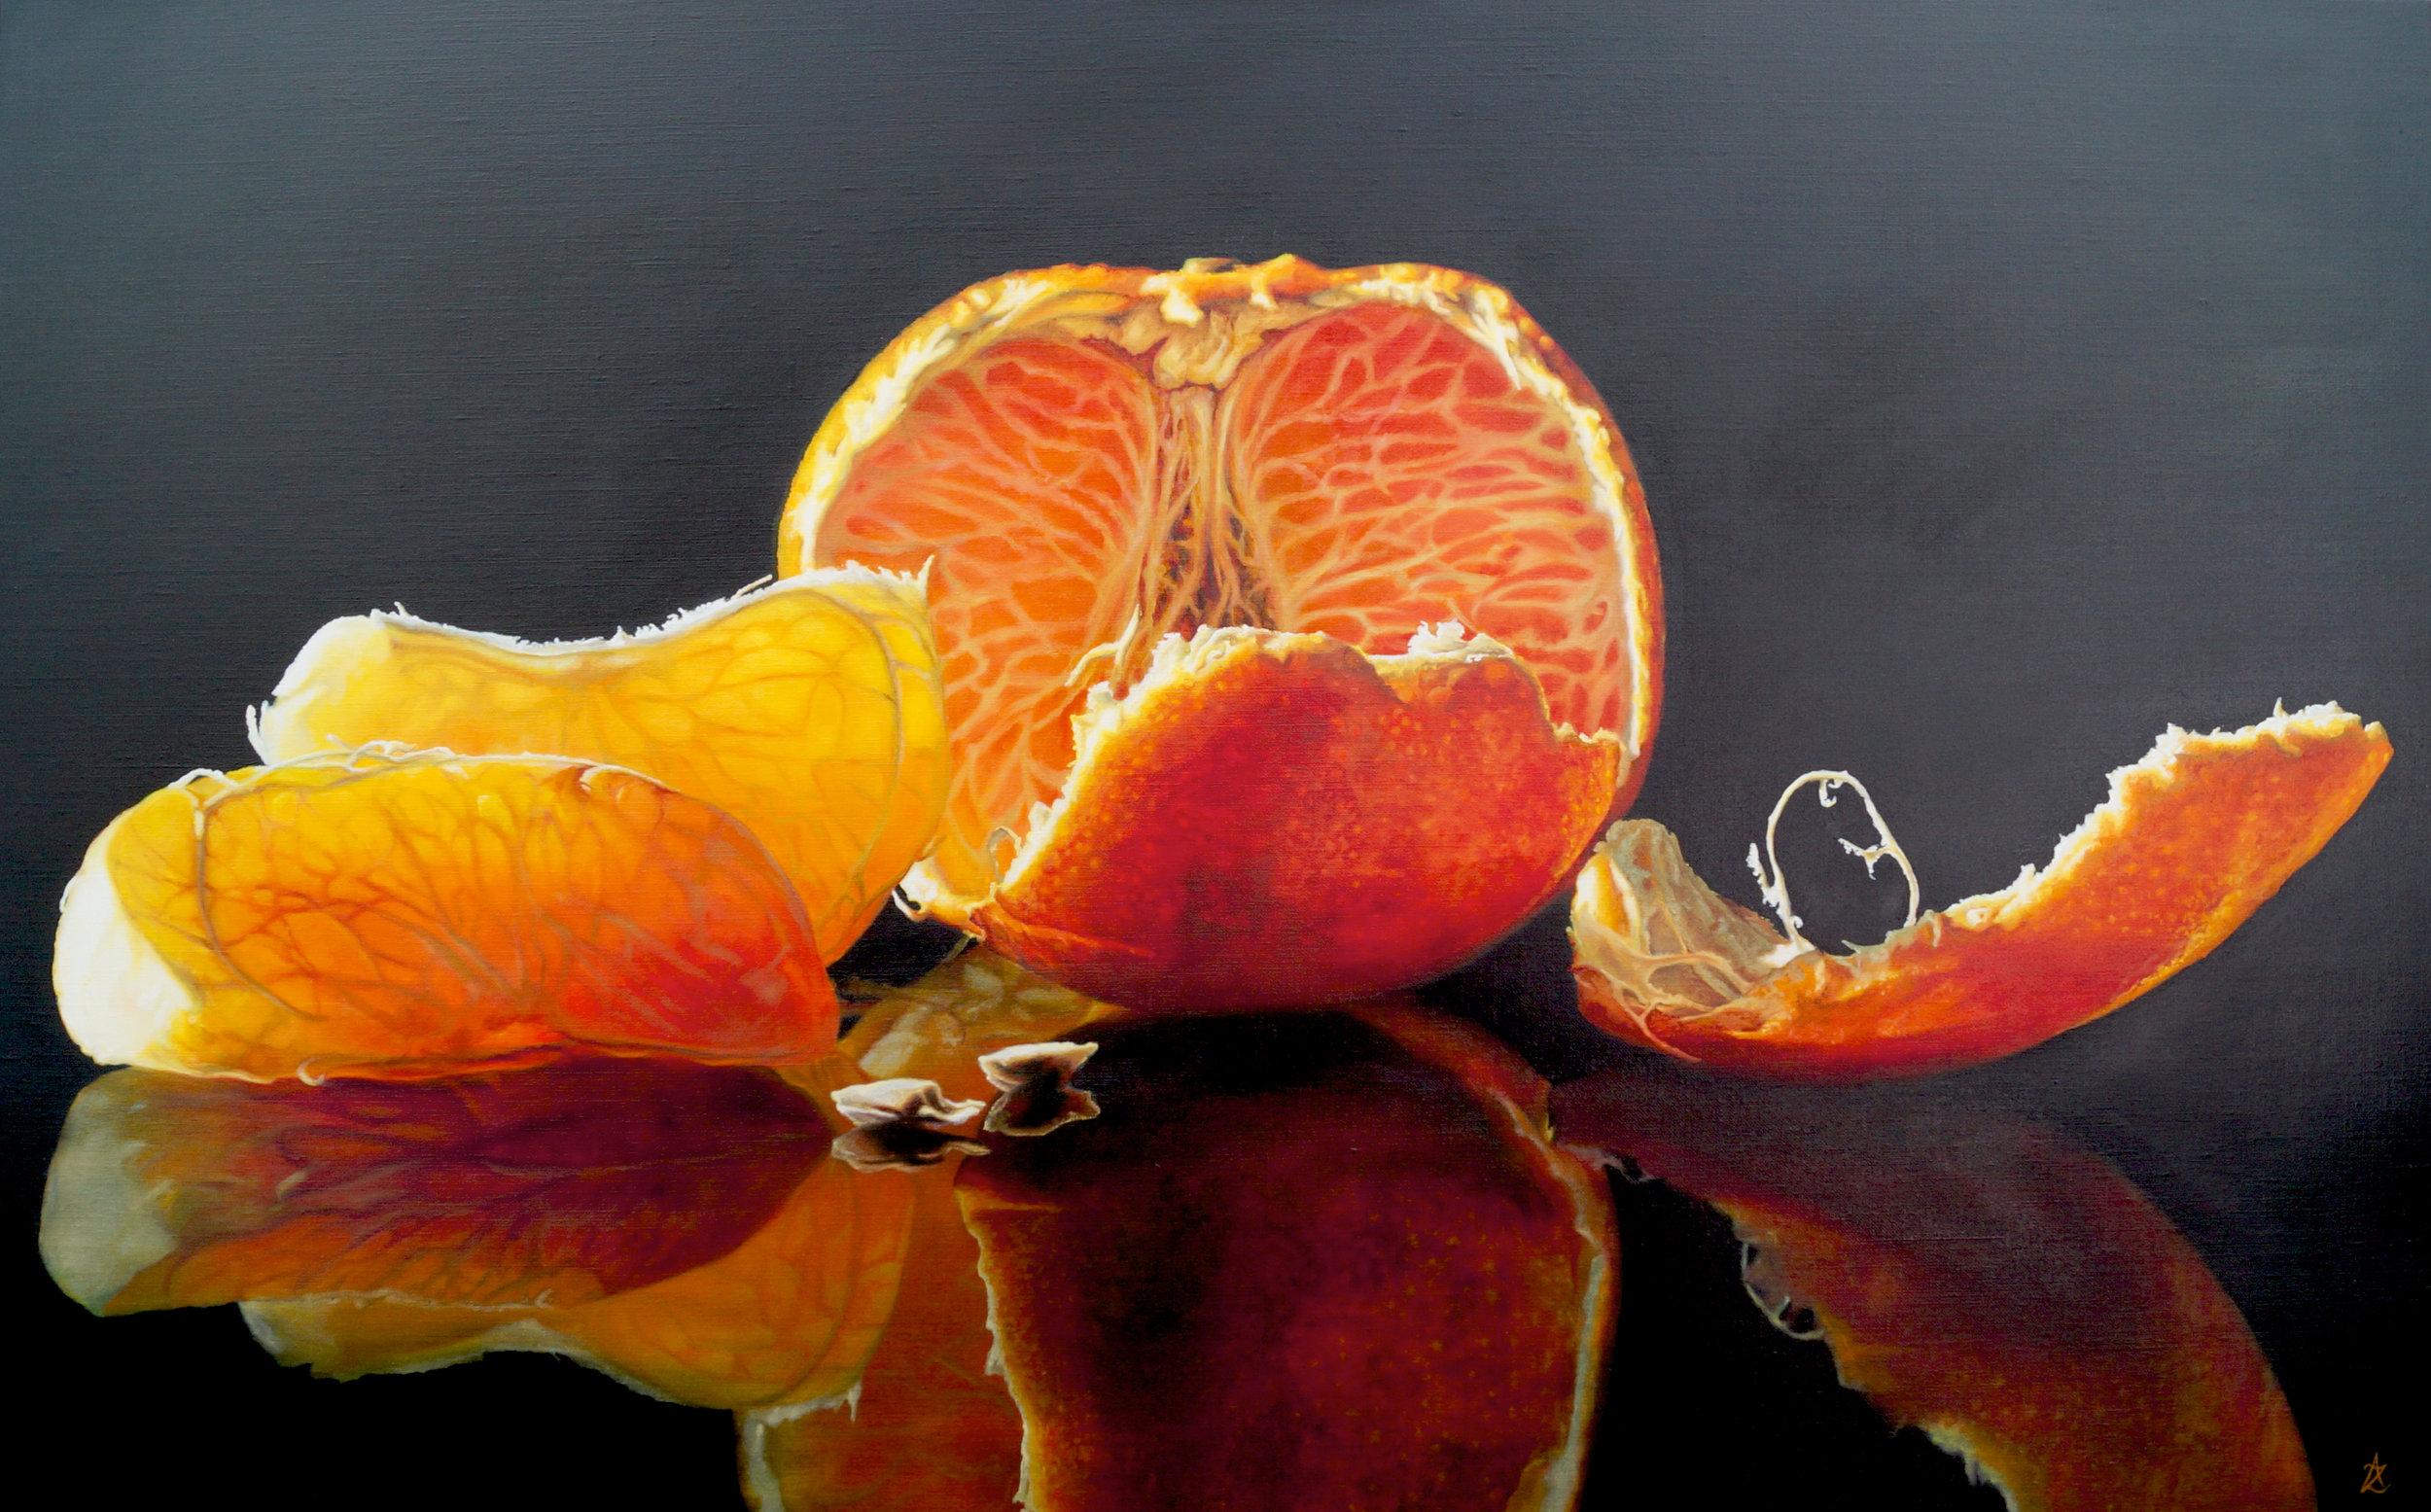 Transculent Mandarin - Award winner